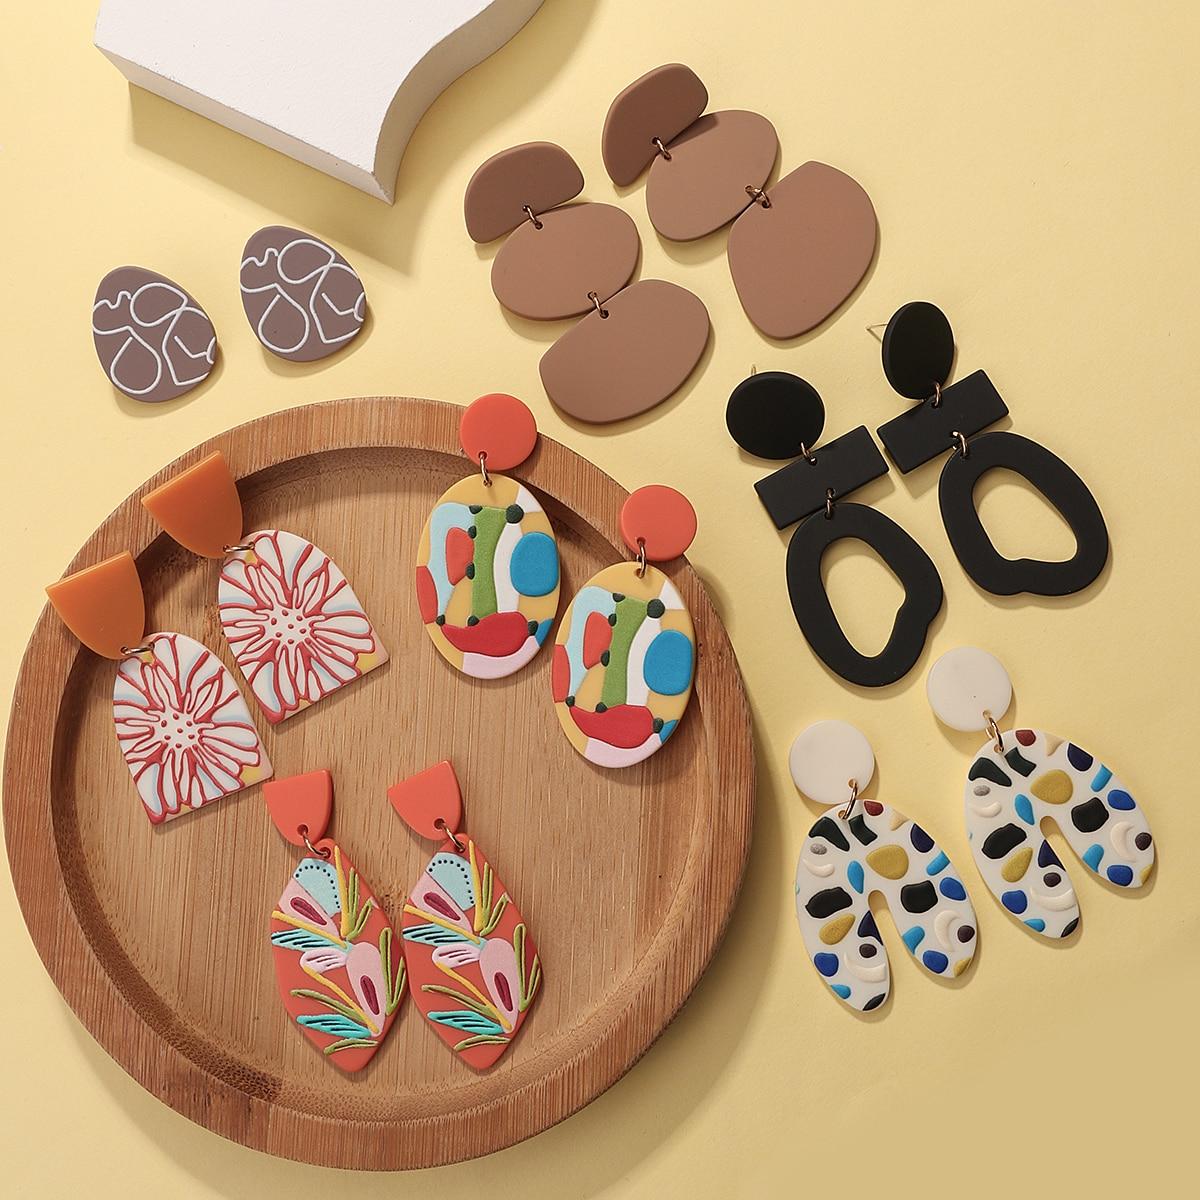 AENSOA Fashion Multi-type Irregular Acrylic Drop Earrings Colorful Graffiti Simulated Polymer Clay Geometric Earrings Gift